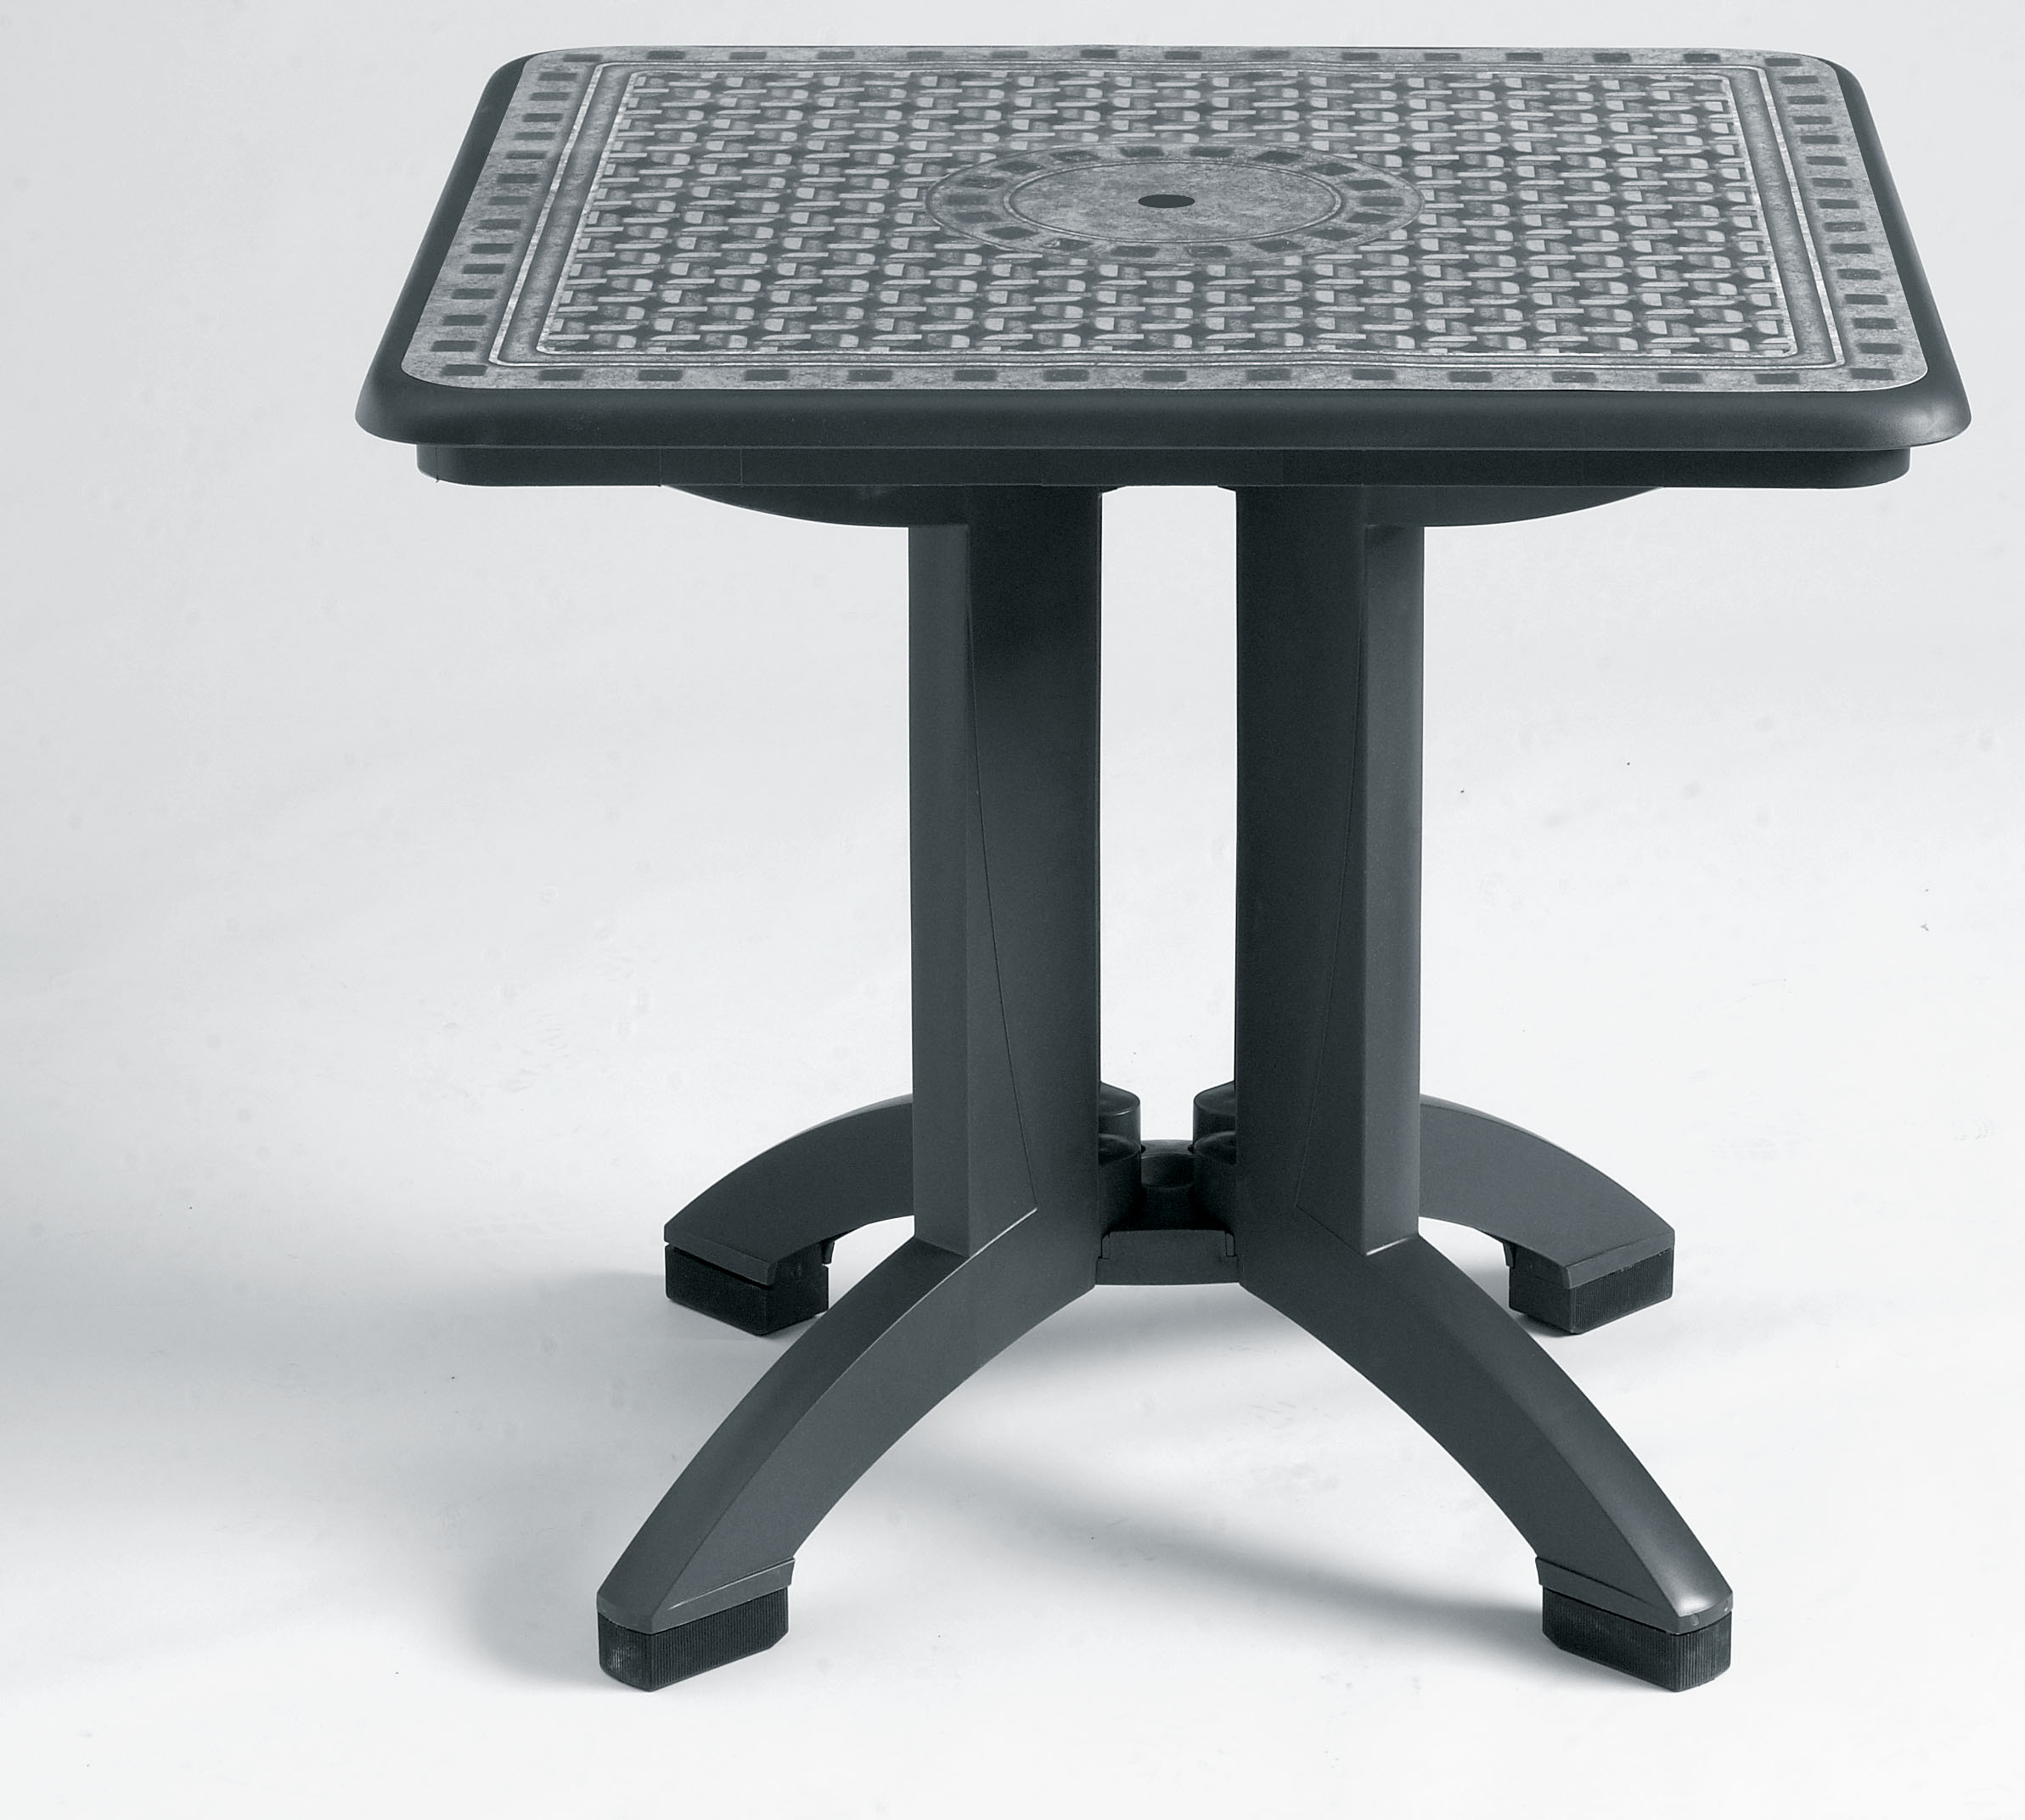 Grosfillex Toledo 32 in Sq Pedestal Folding Resin Patio Dining